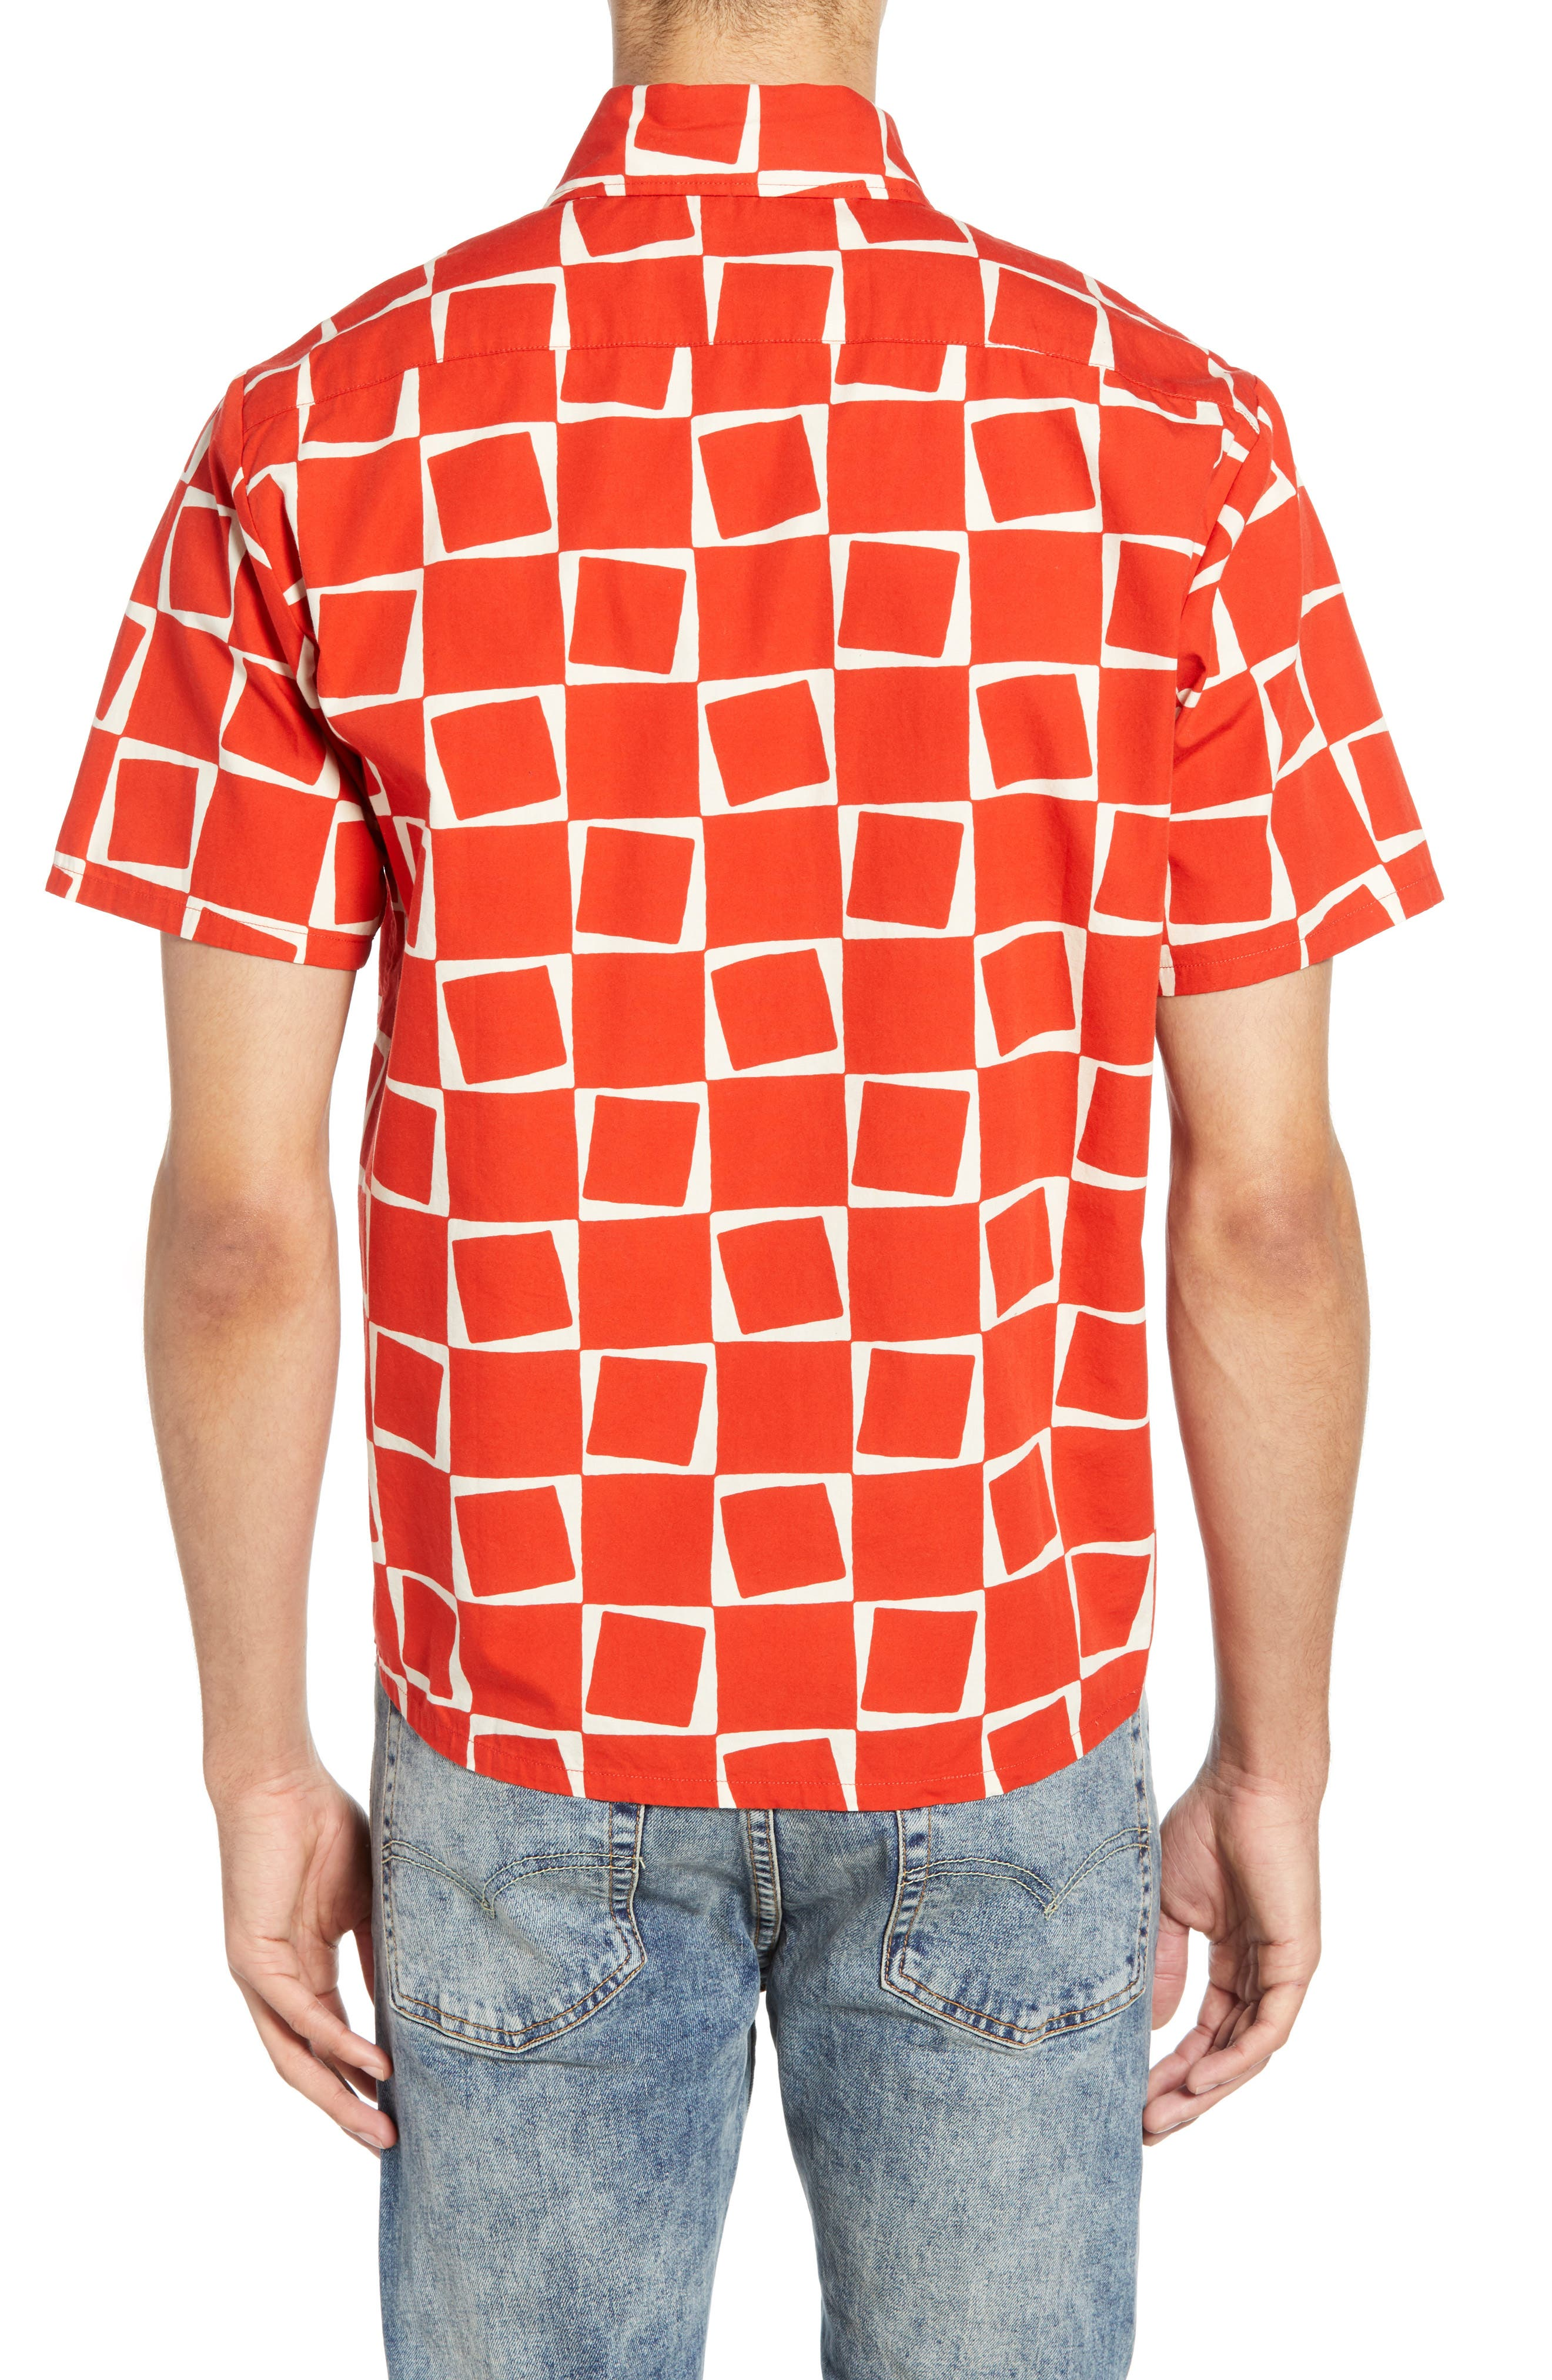 LEVI'S<SUP>®</SUP> VINTAGE CLOTHING, 1950s Regular Atomic Square Woven Shirt, Alternate thumbnail 3, color, 600